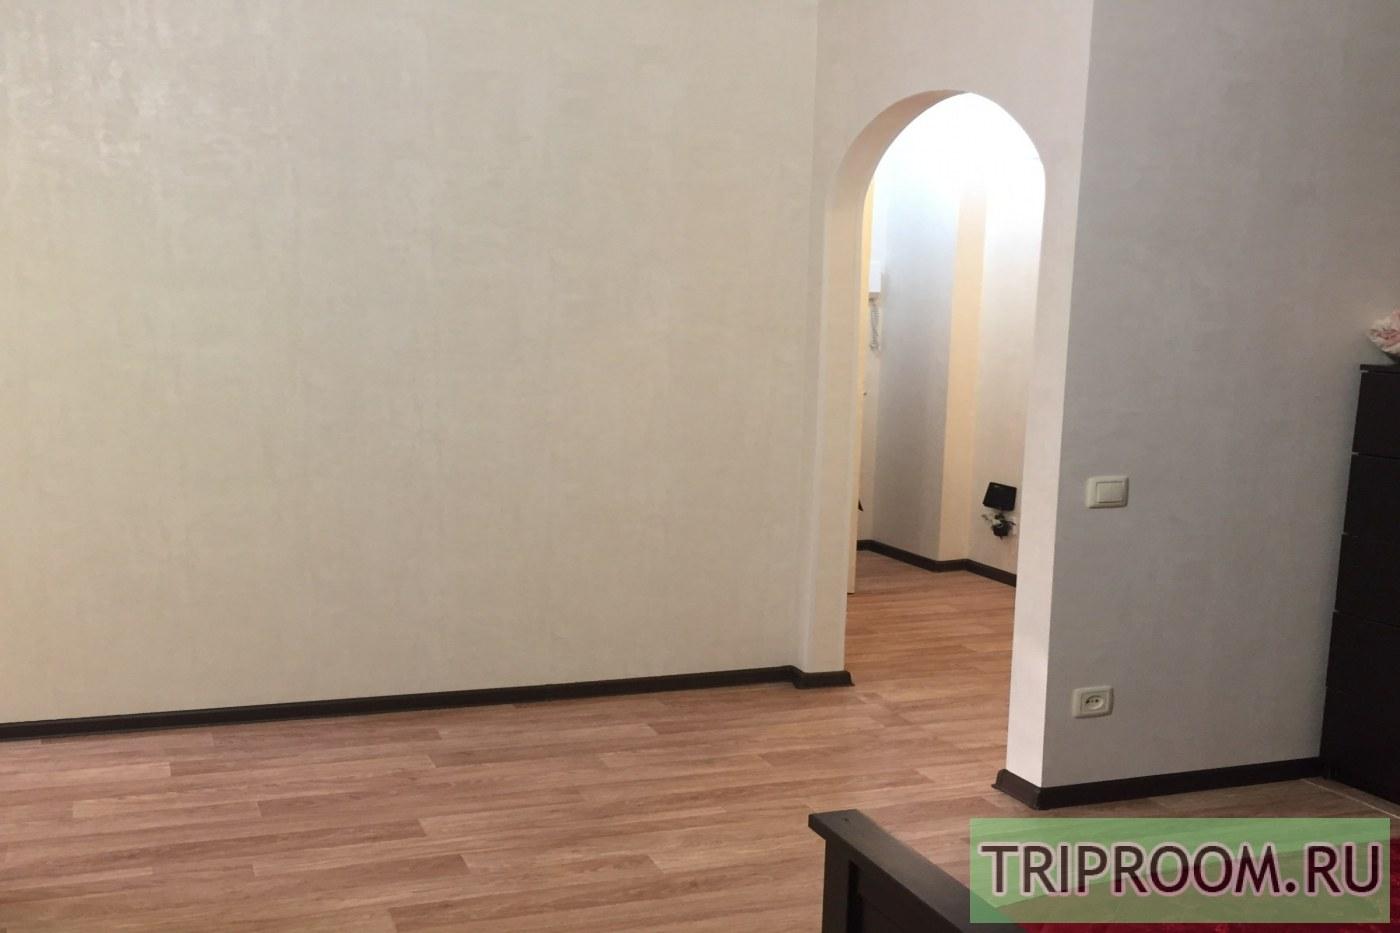 1-комнатная квартира посуточно (вариант № 2841), ул. Коротченко улица, фото № 3